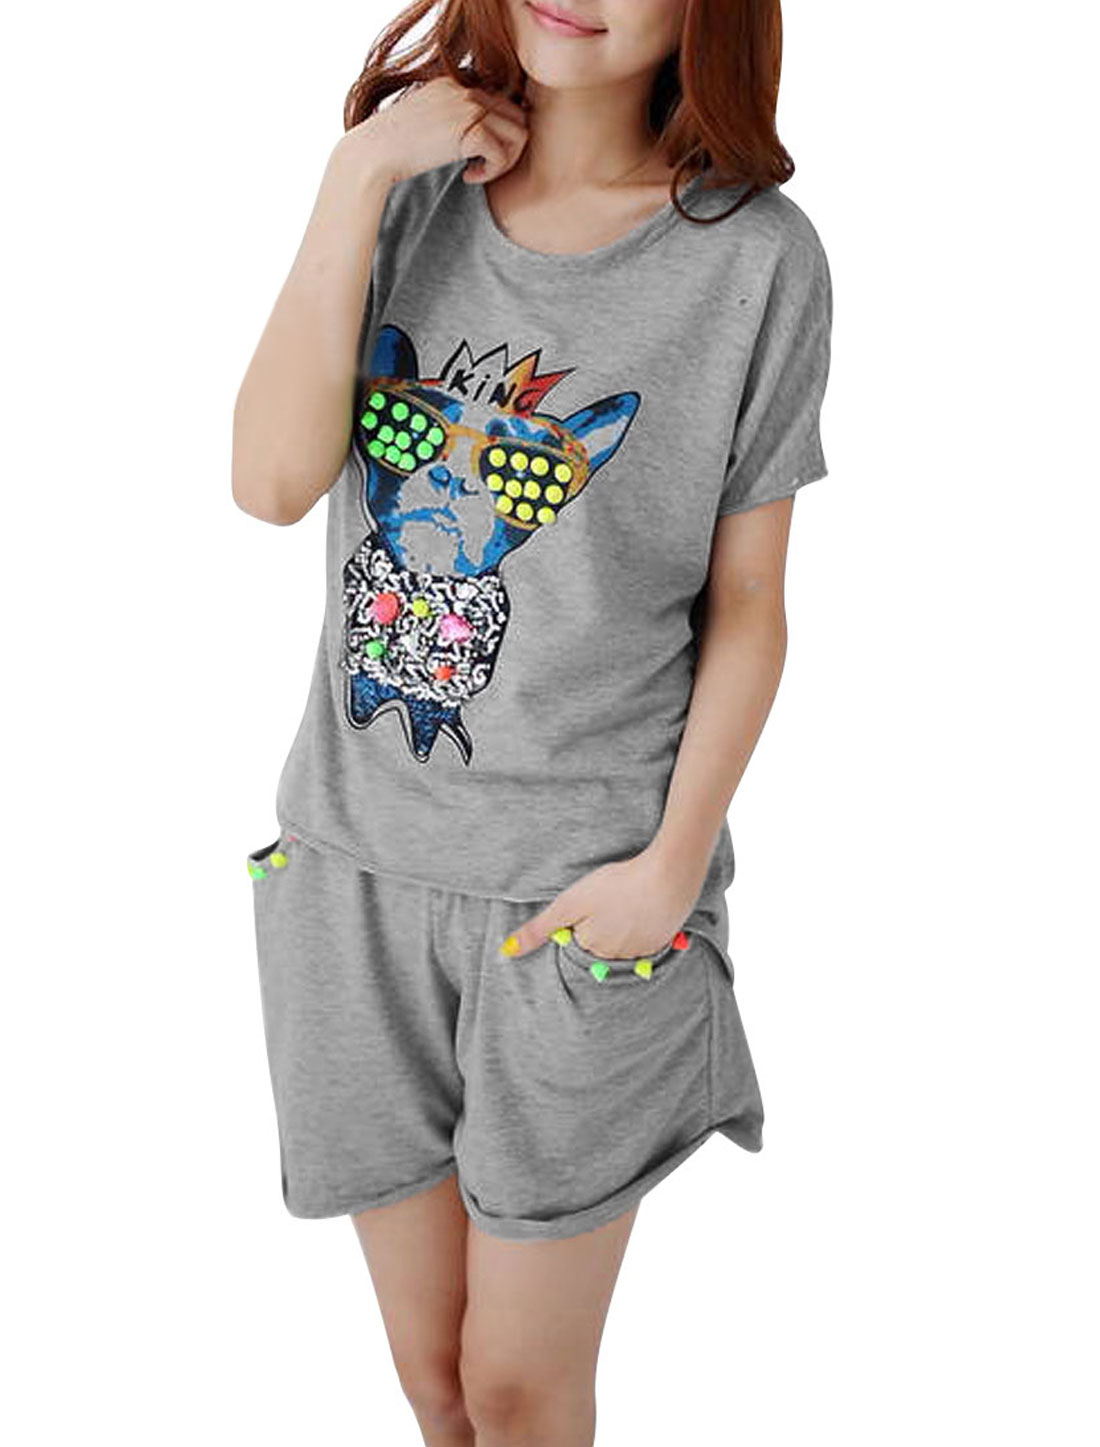 Woman Light Gray Cartoon Dog pattern Shirt w Rivets Decor Shorts S